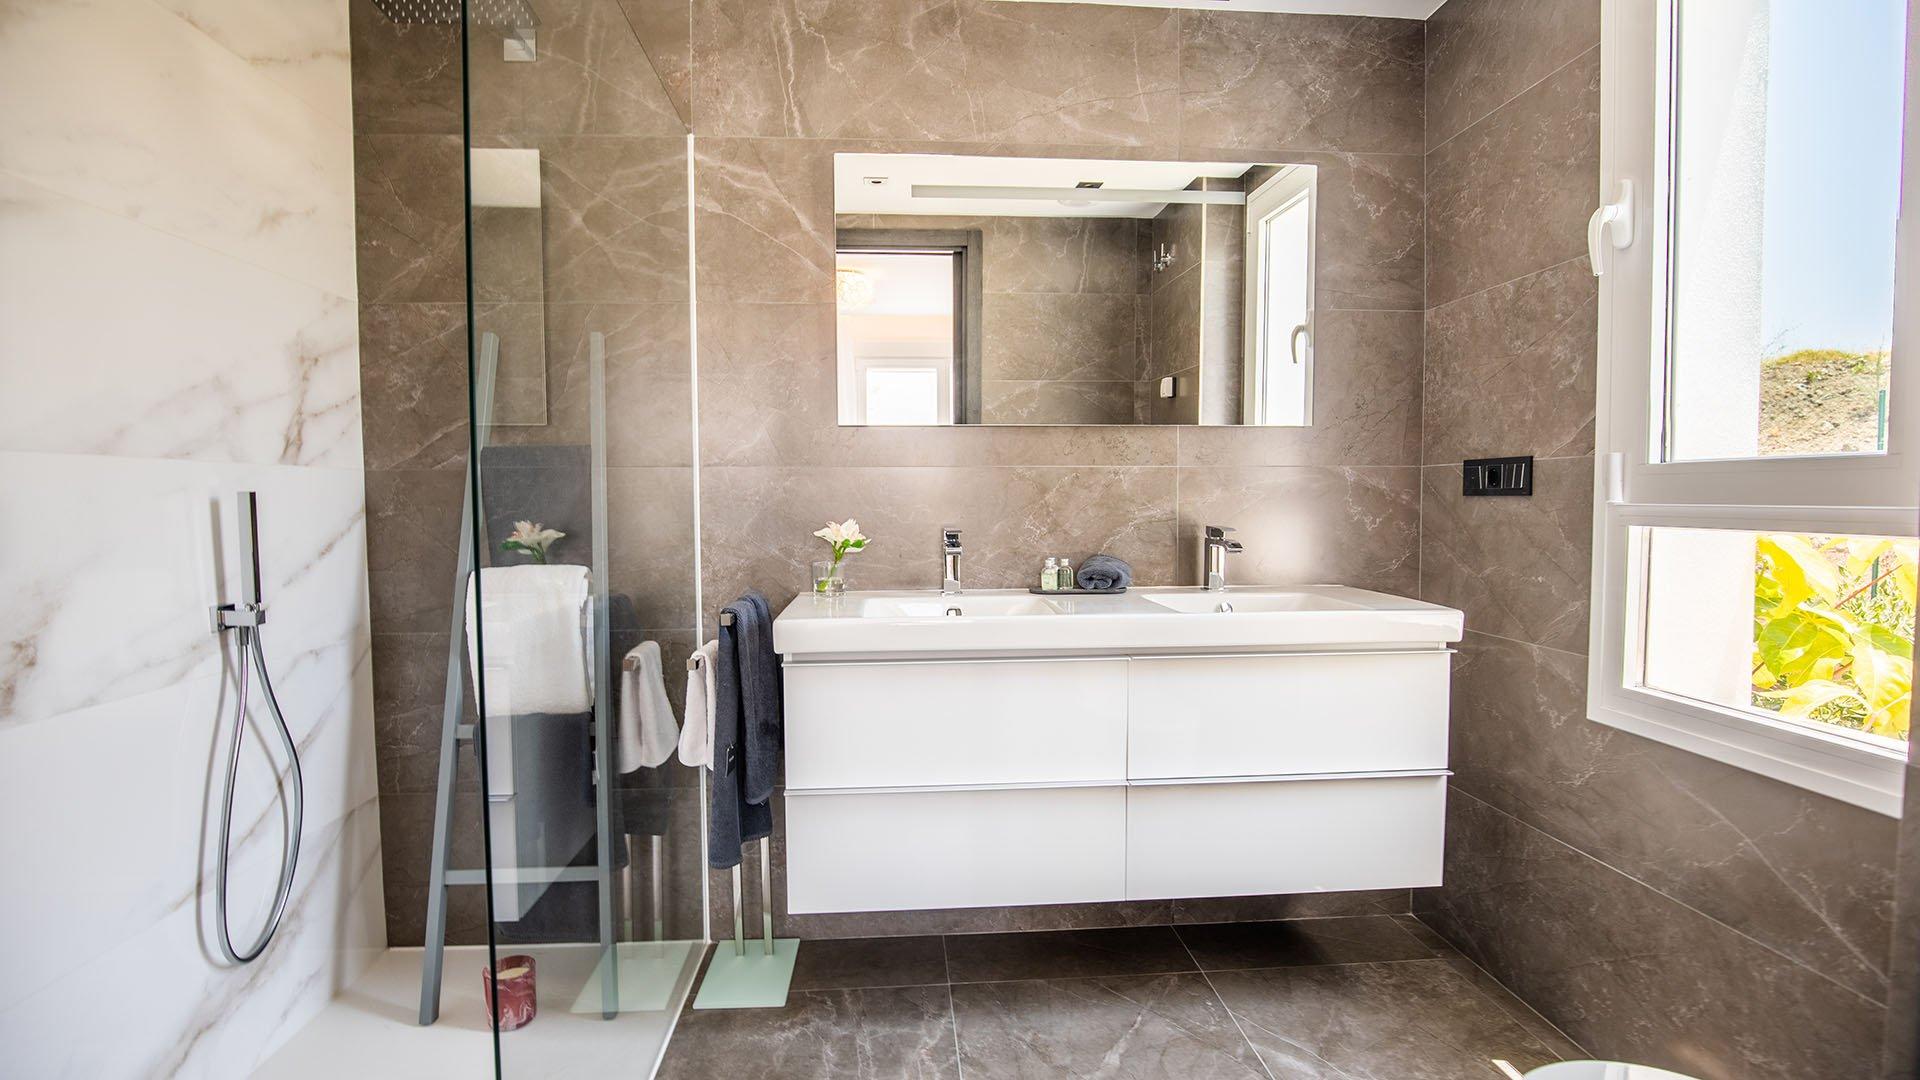 Le Caprice: Exclusive penthouses in La Quinta Golf in Benahavís